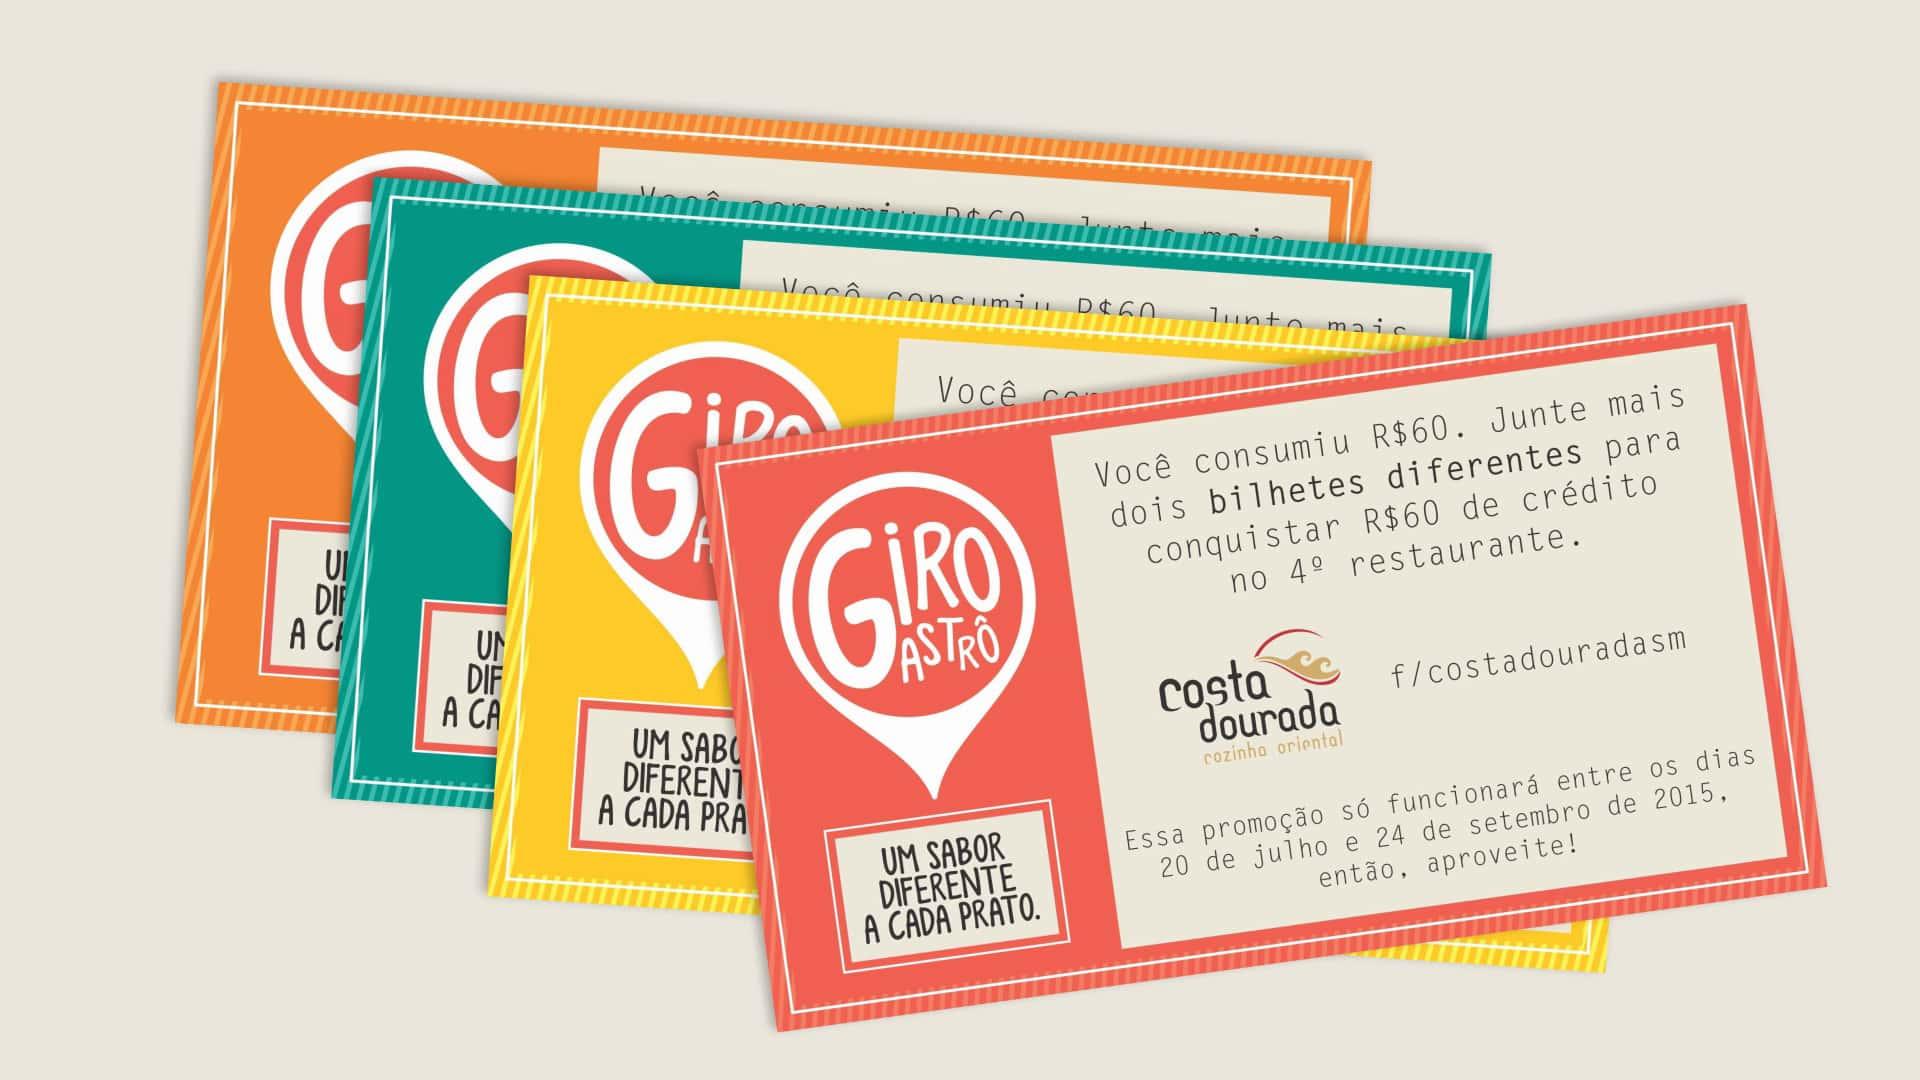 Giro Gastrô